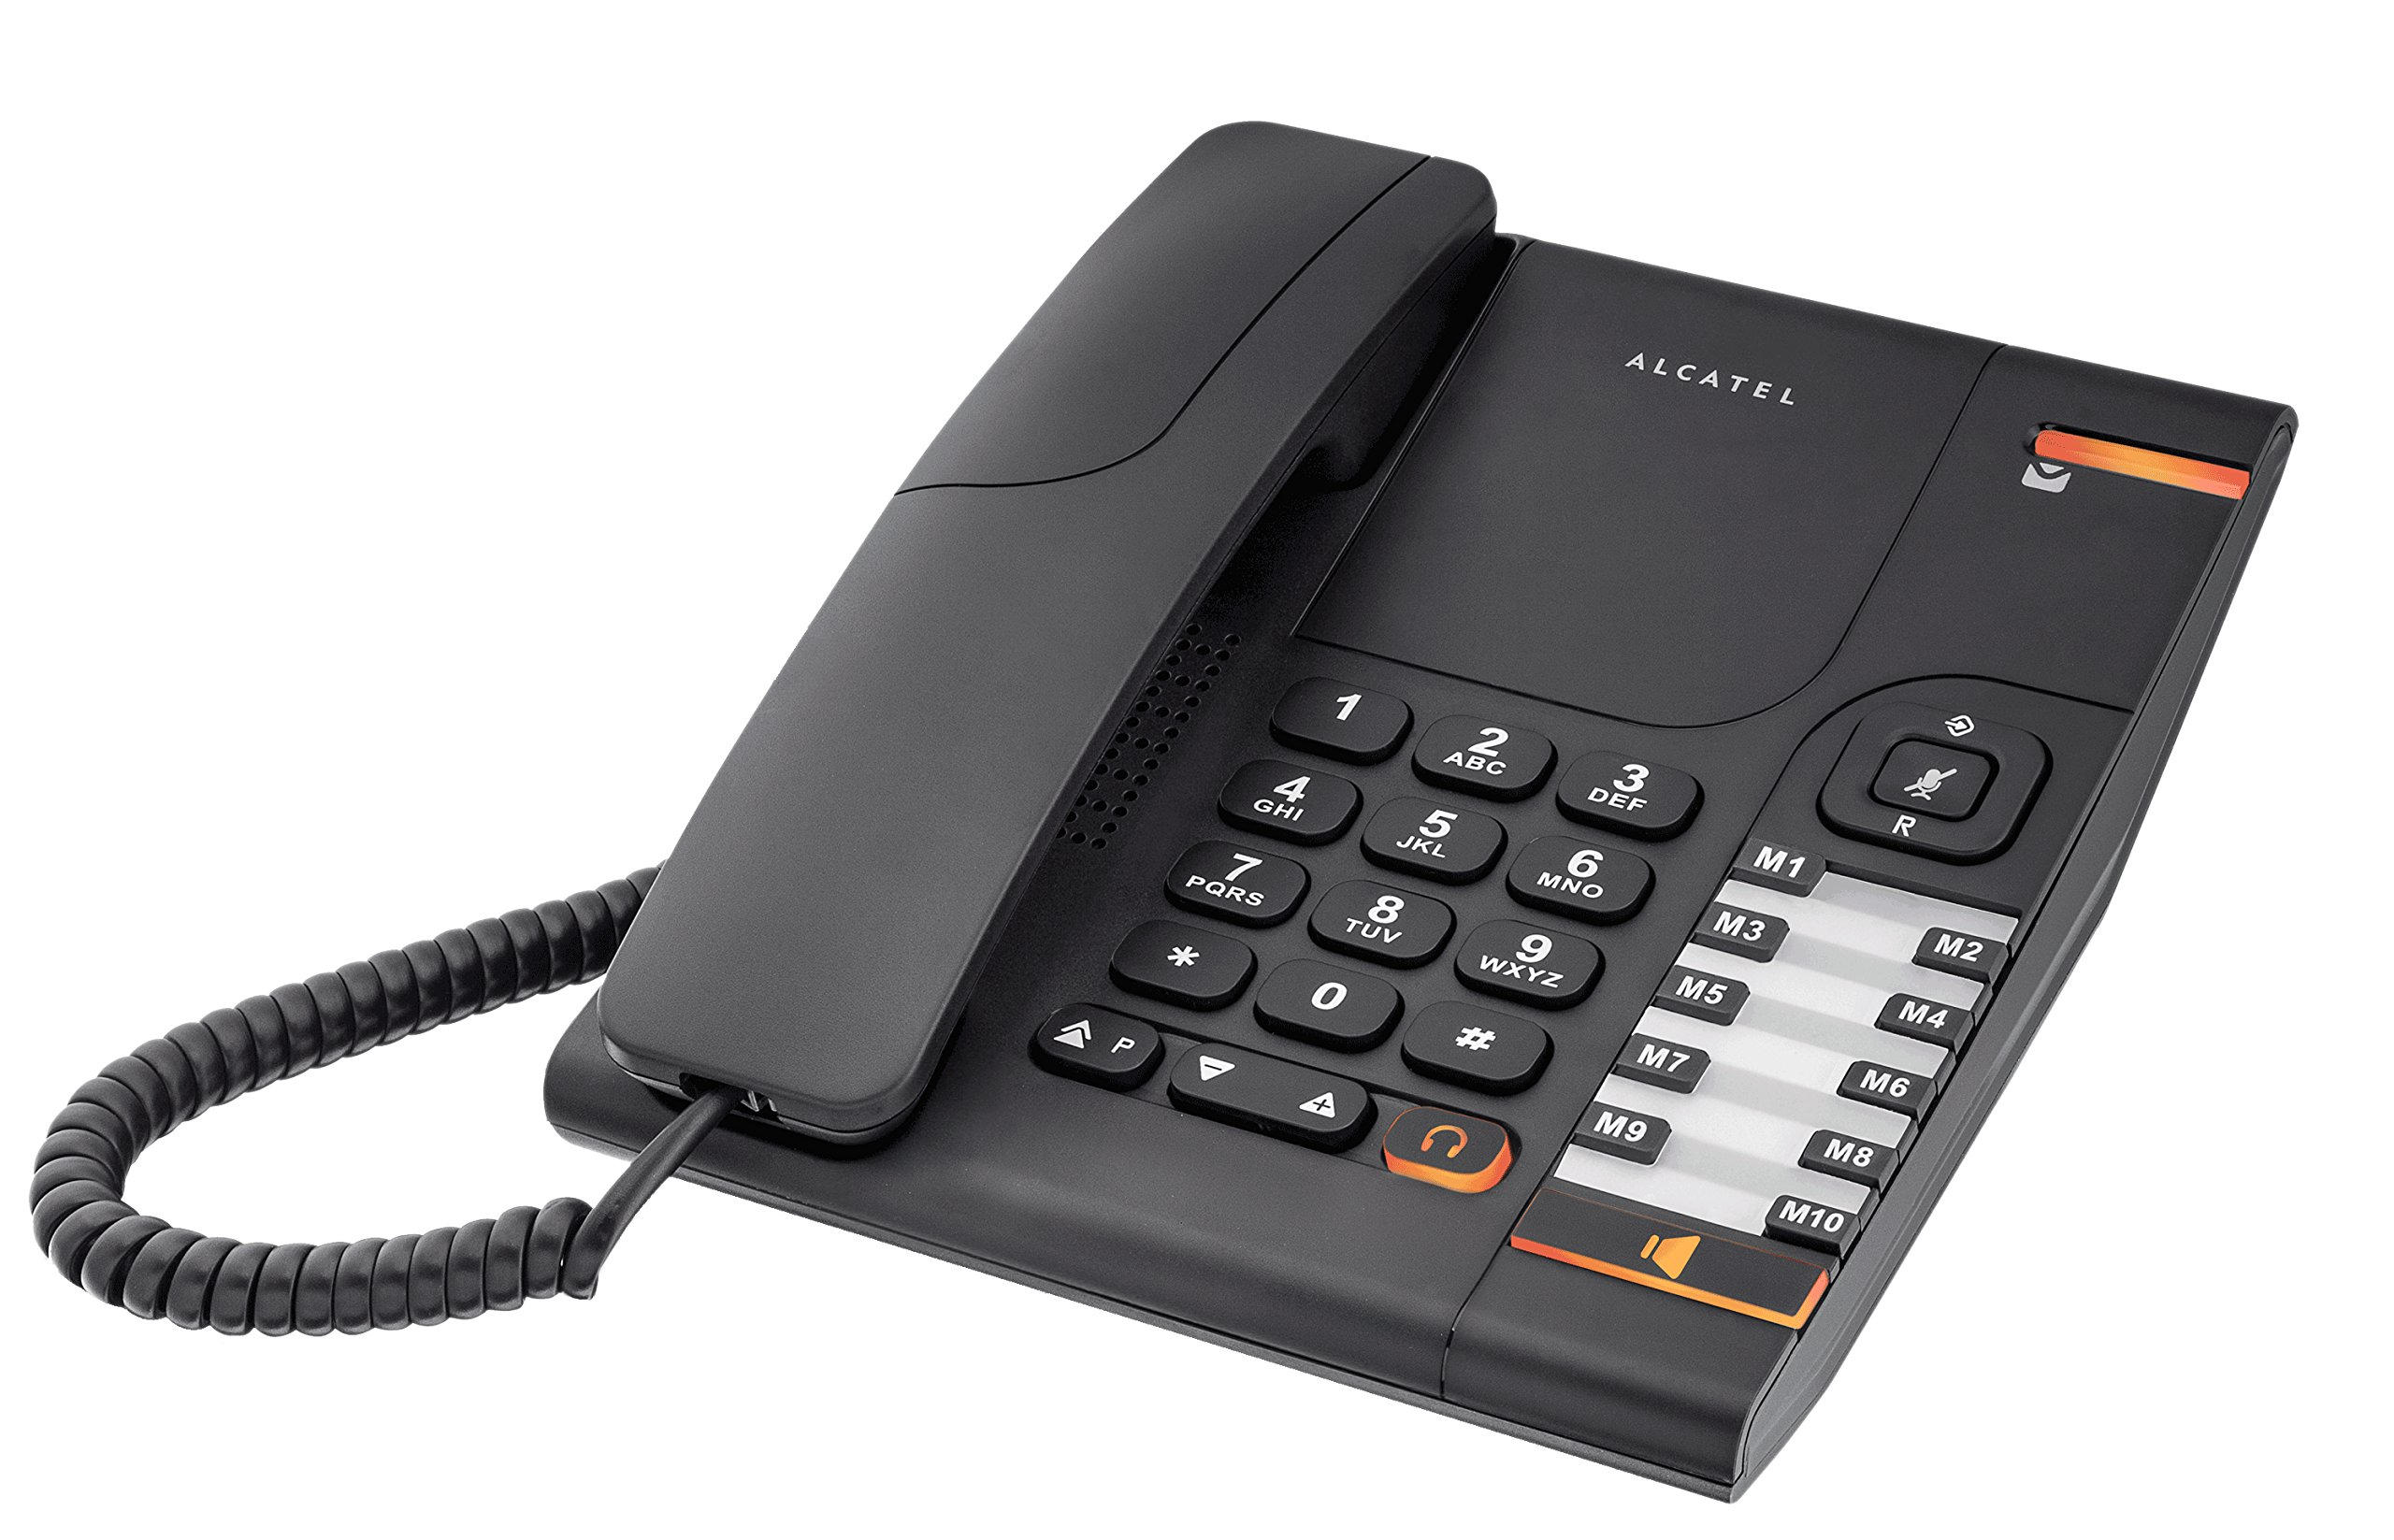 Alcatel Temporis PRO 380 (Hands Free Functionality)